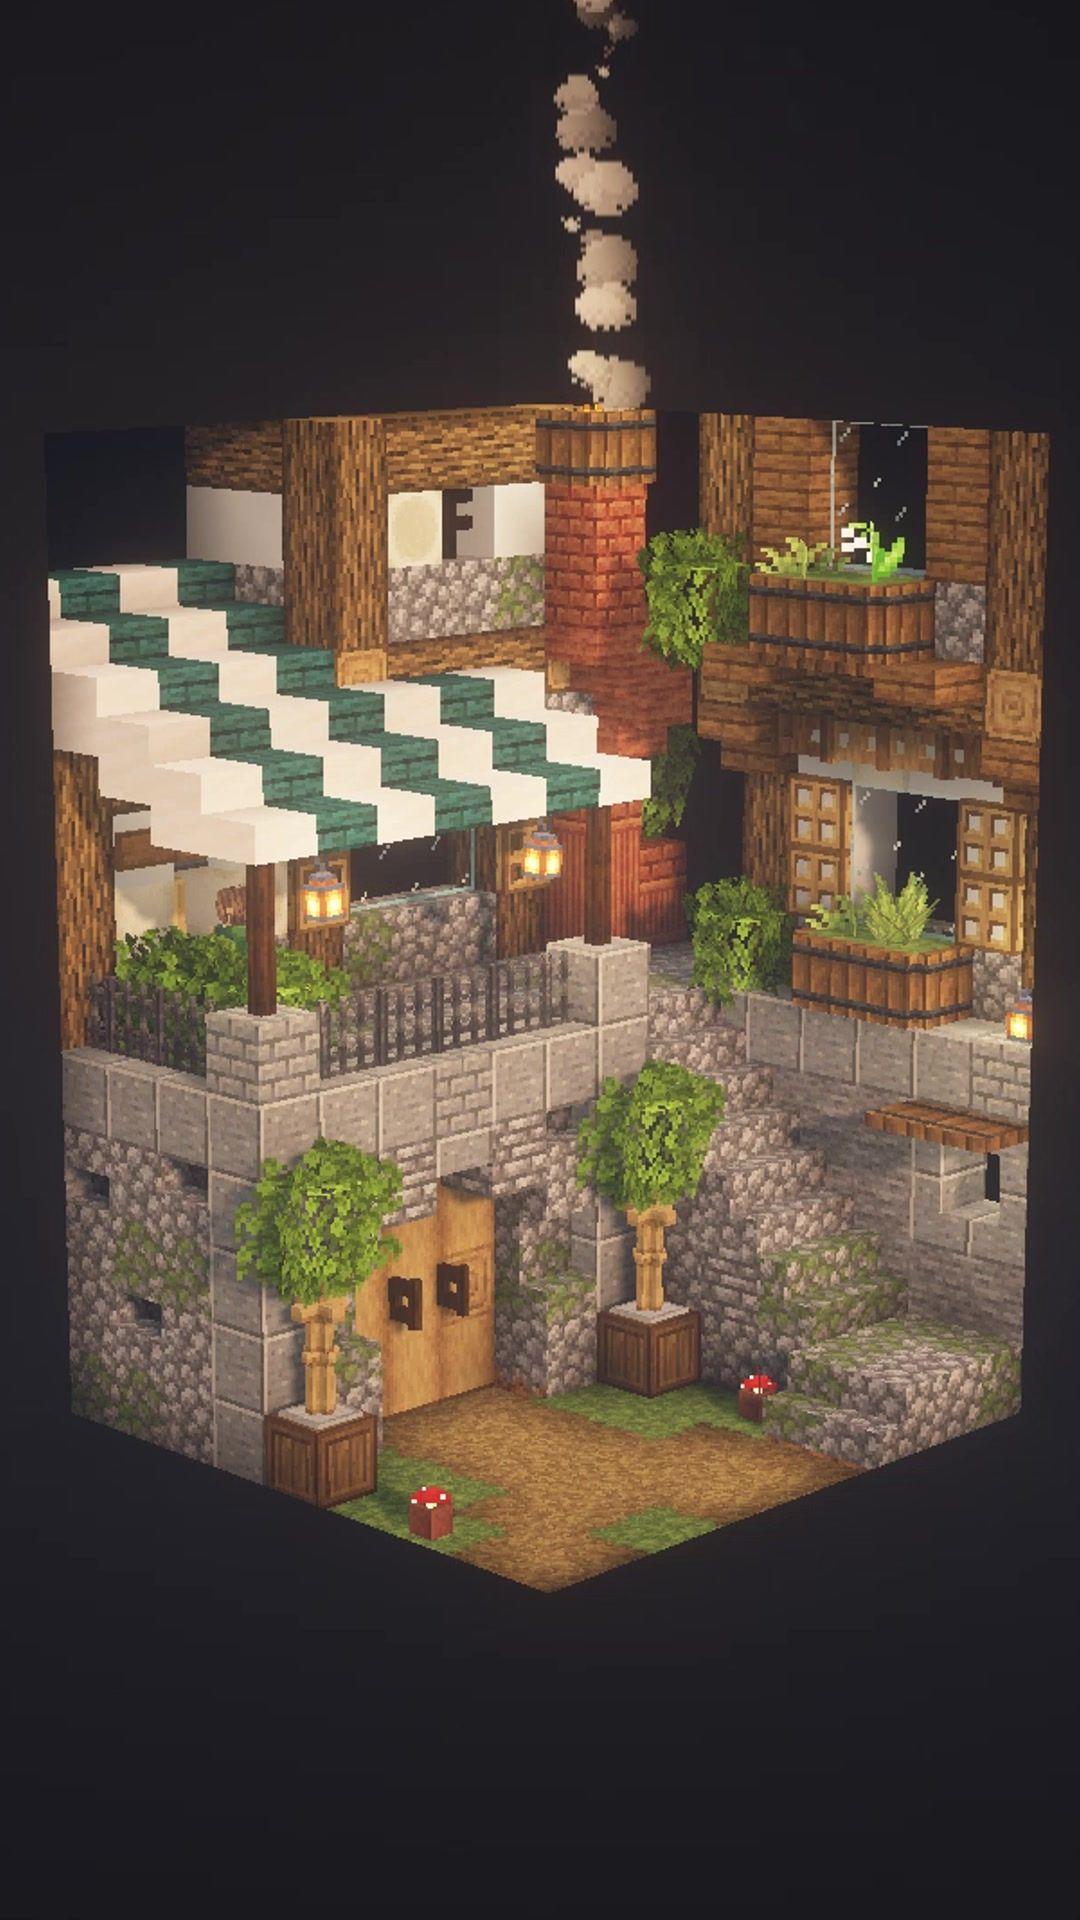 Fresh Joy Fresh Joy Tiktok Watch Fresh Joy S Newest Tiktok Videos In 2021 Minecraft Architecture Minecraft Houses Cute Minecraft Houses